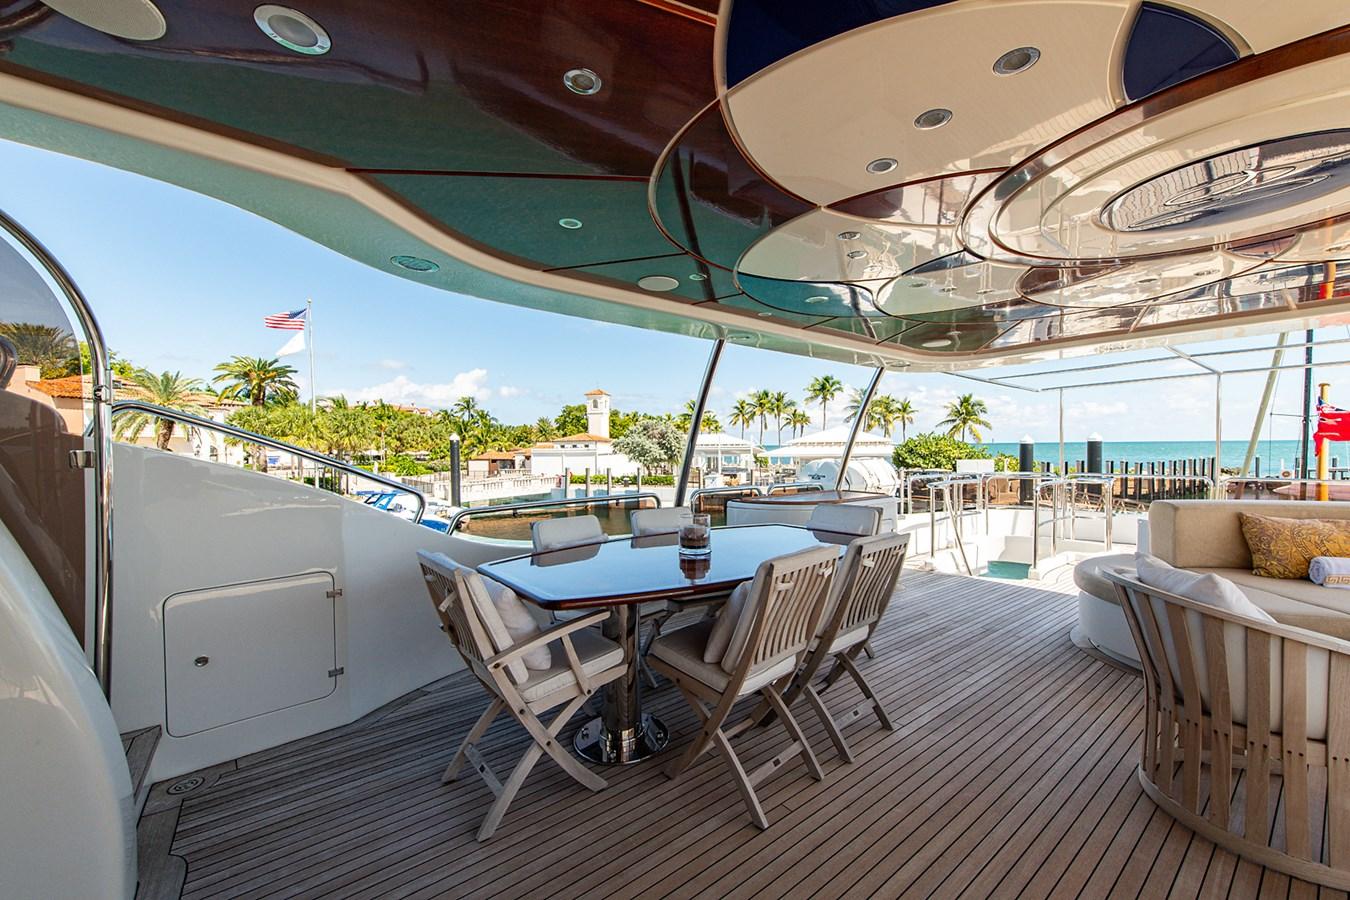 Rutli E_Pilot House Aft Deck3 2006 BENETTI  Motor Yacht 2802299